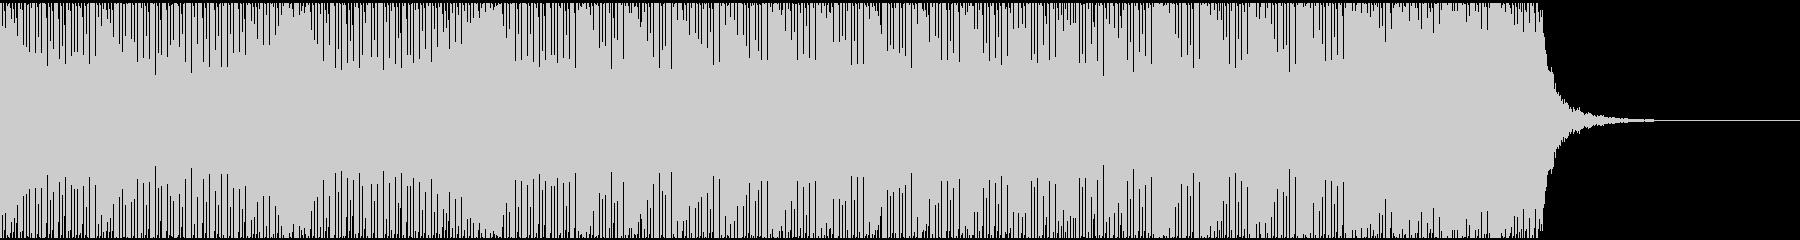 【EDM】クラブダンスミュージックの未再生の波形